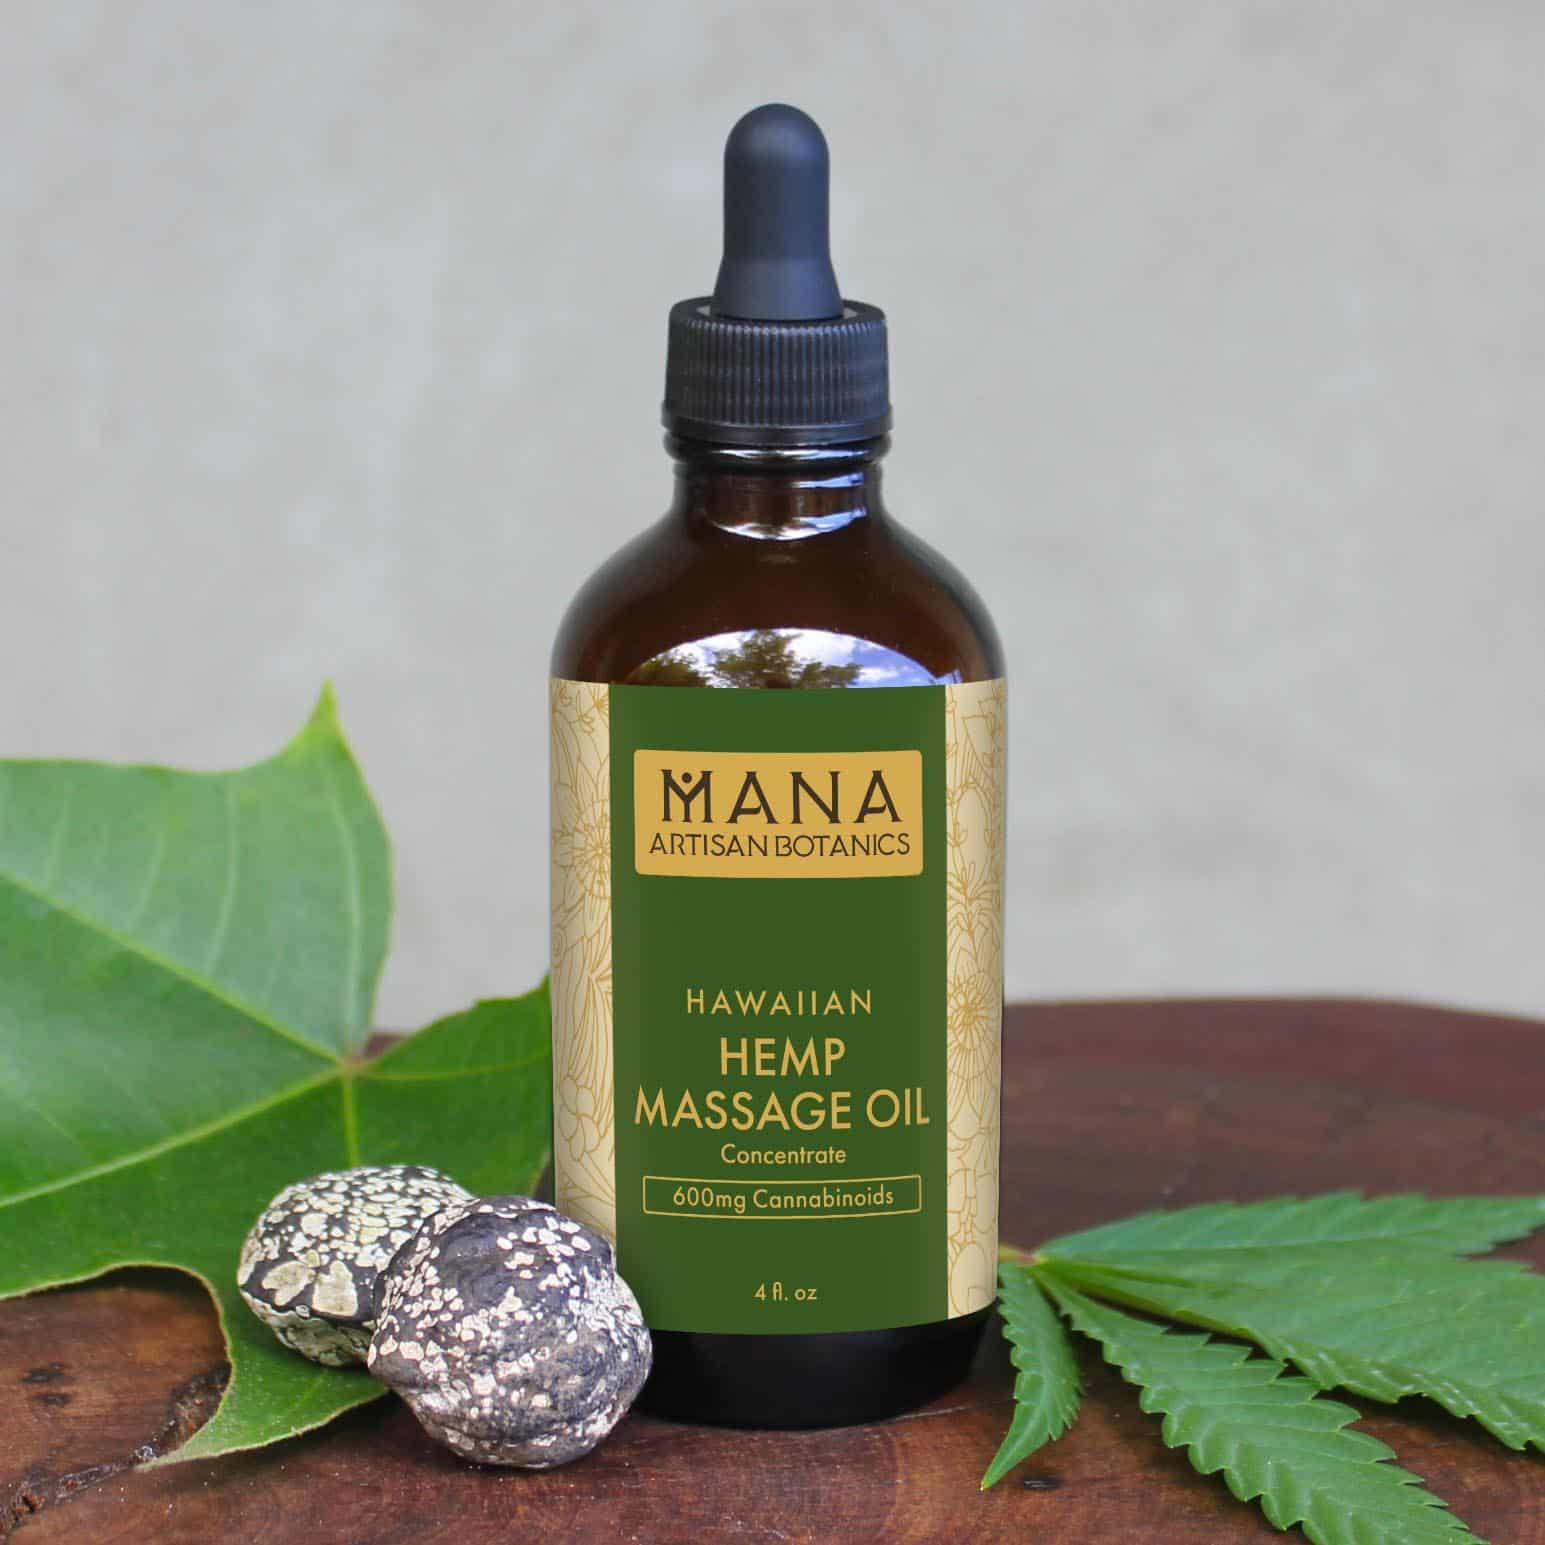 Mana Artisan Botanics Coconut CBD Massage Oil Concentrate